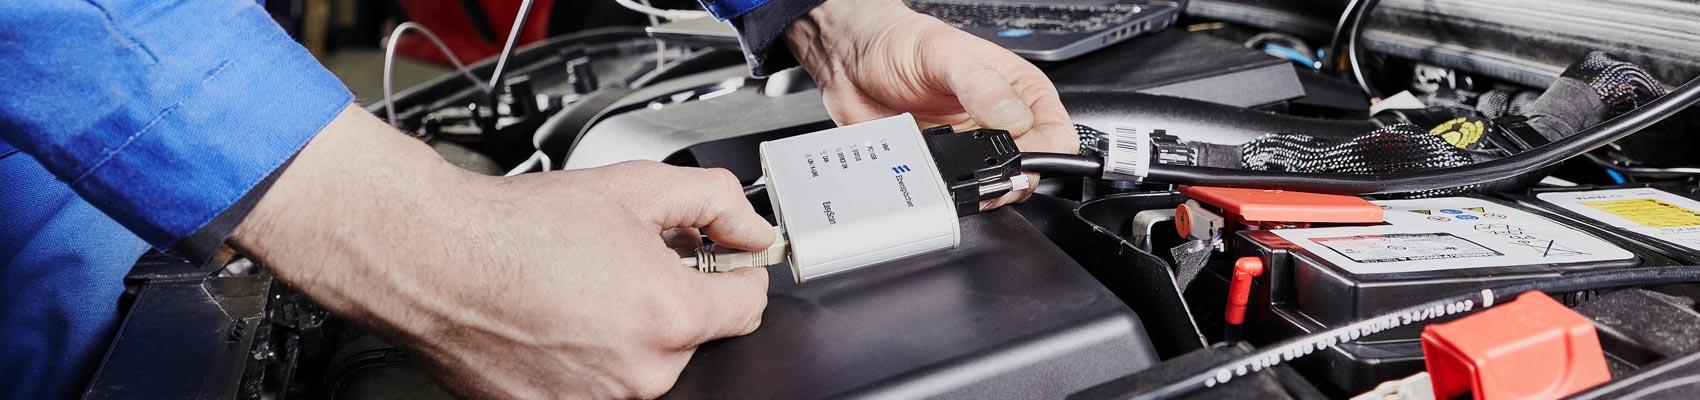 Service Diagnostic Tools - Eberspächer